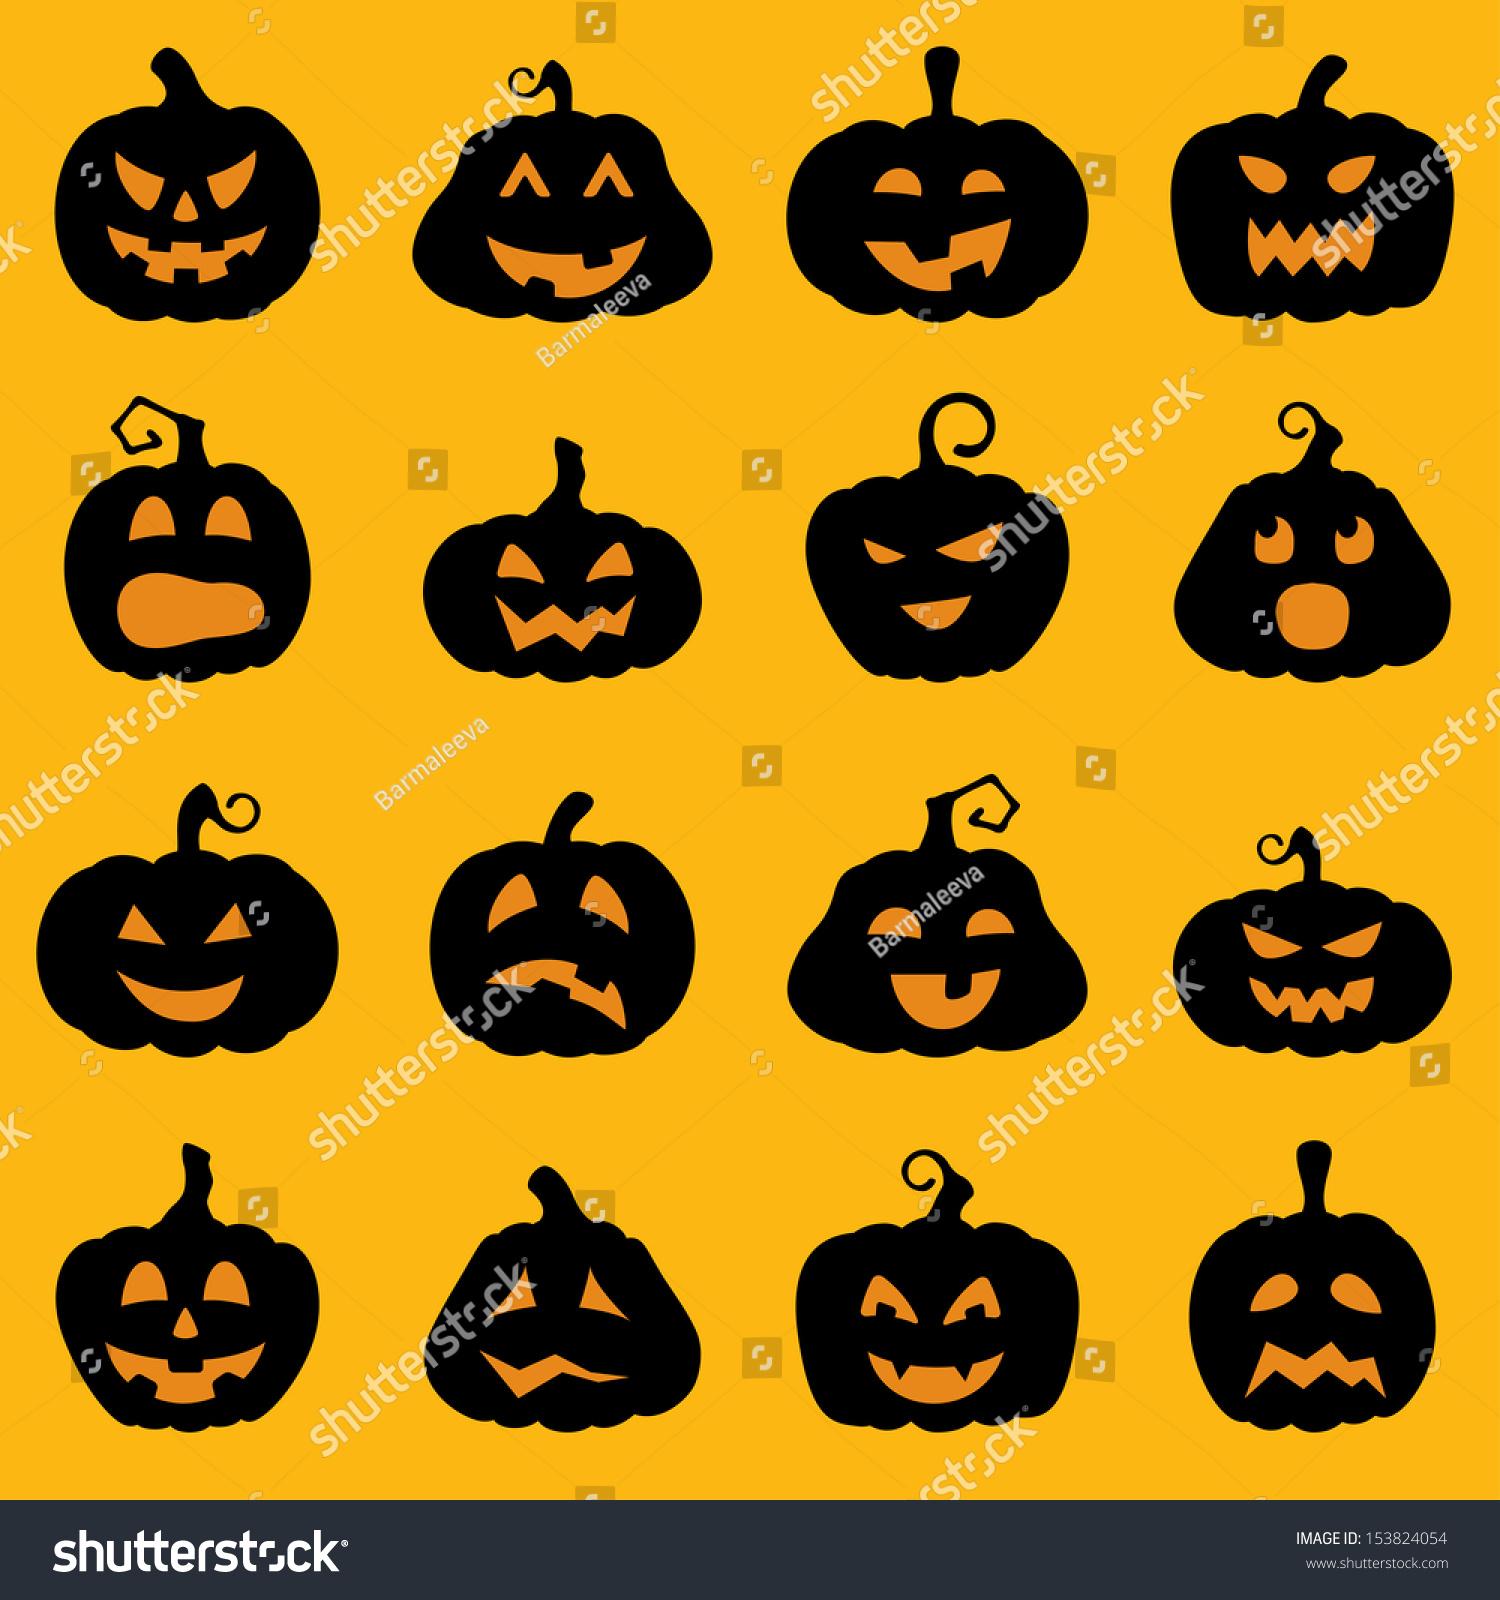 Halloween Decoration Jackolantern Silhouette Set Pumpkins